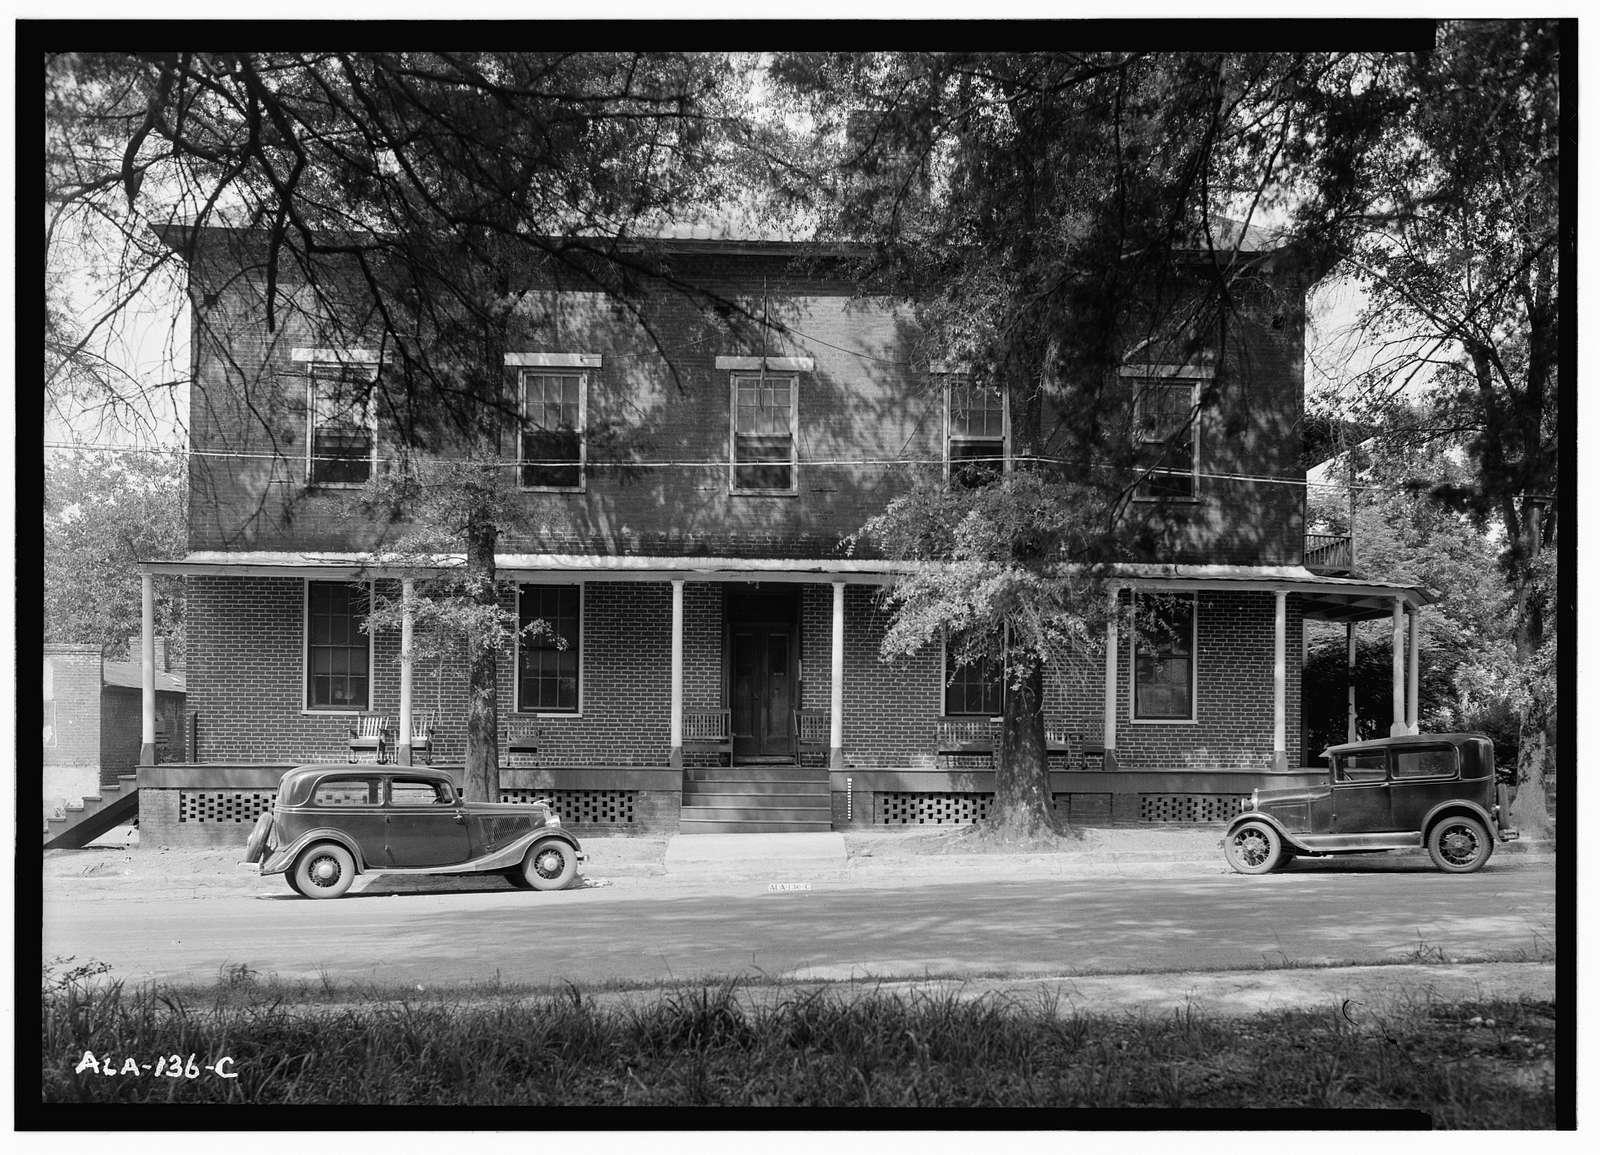 Wilcox Hotel, Broad Street (State Route 28), Camden, Wilcox County, AL